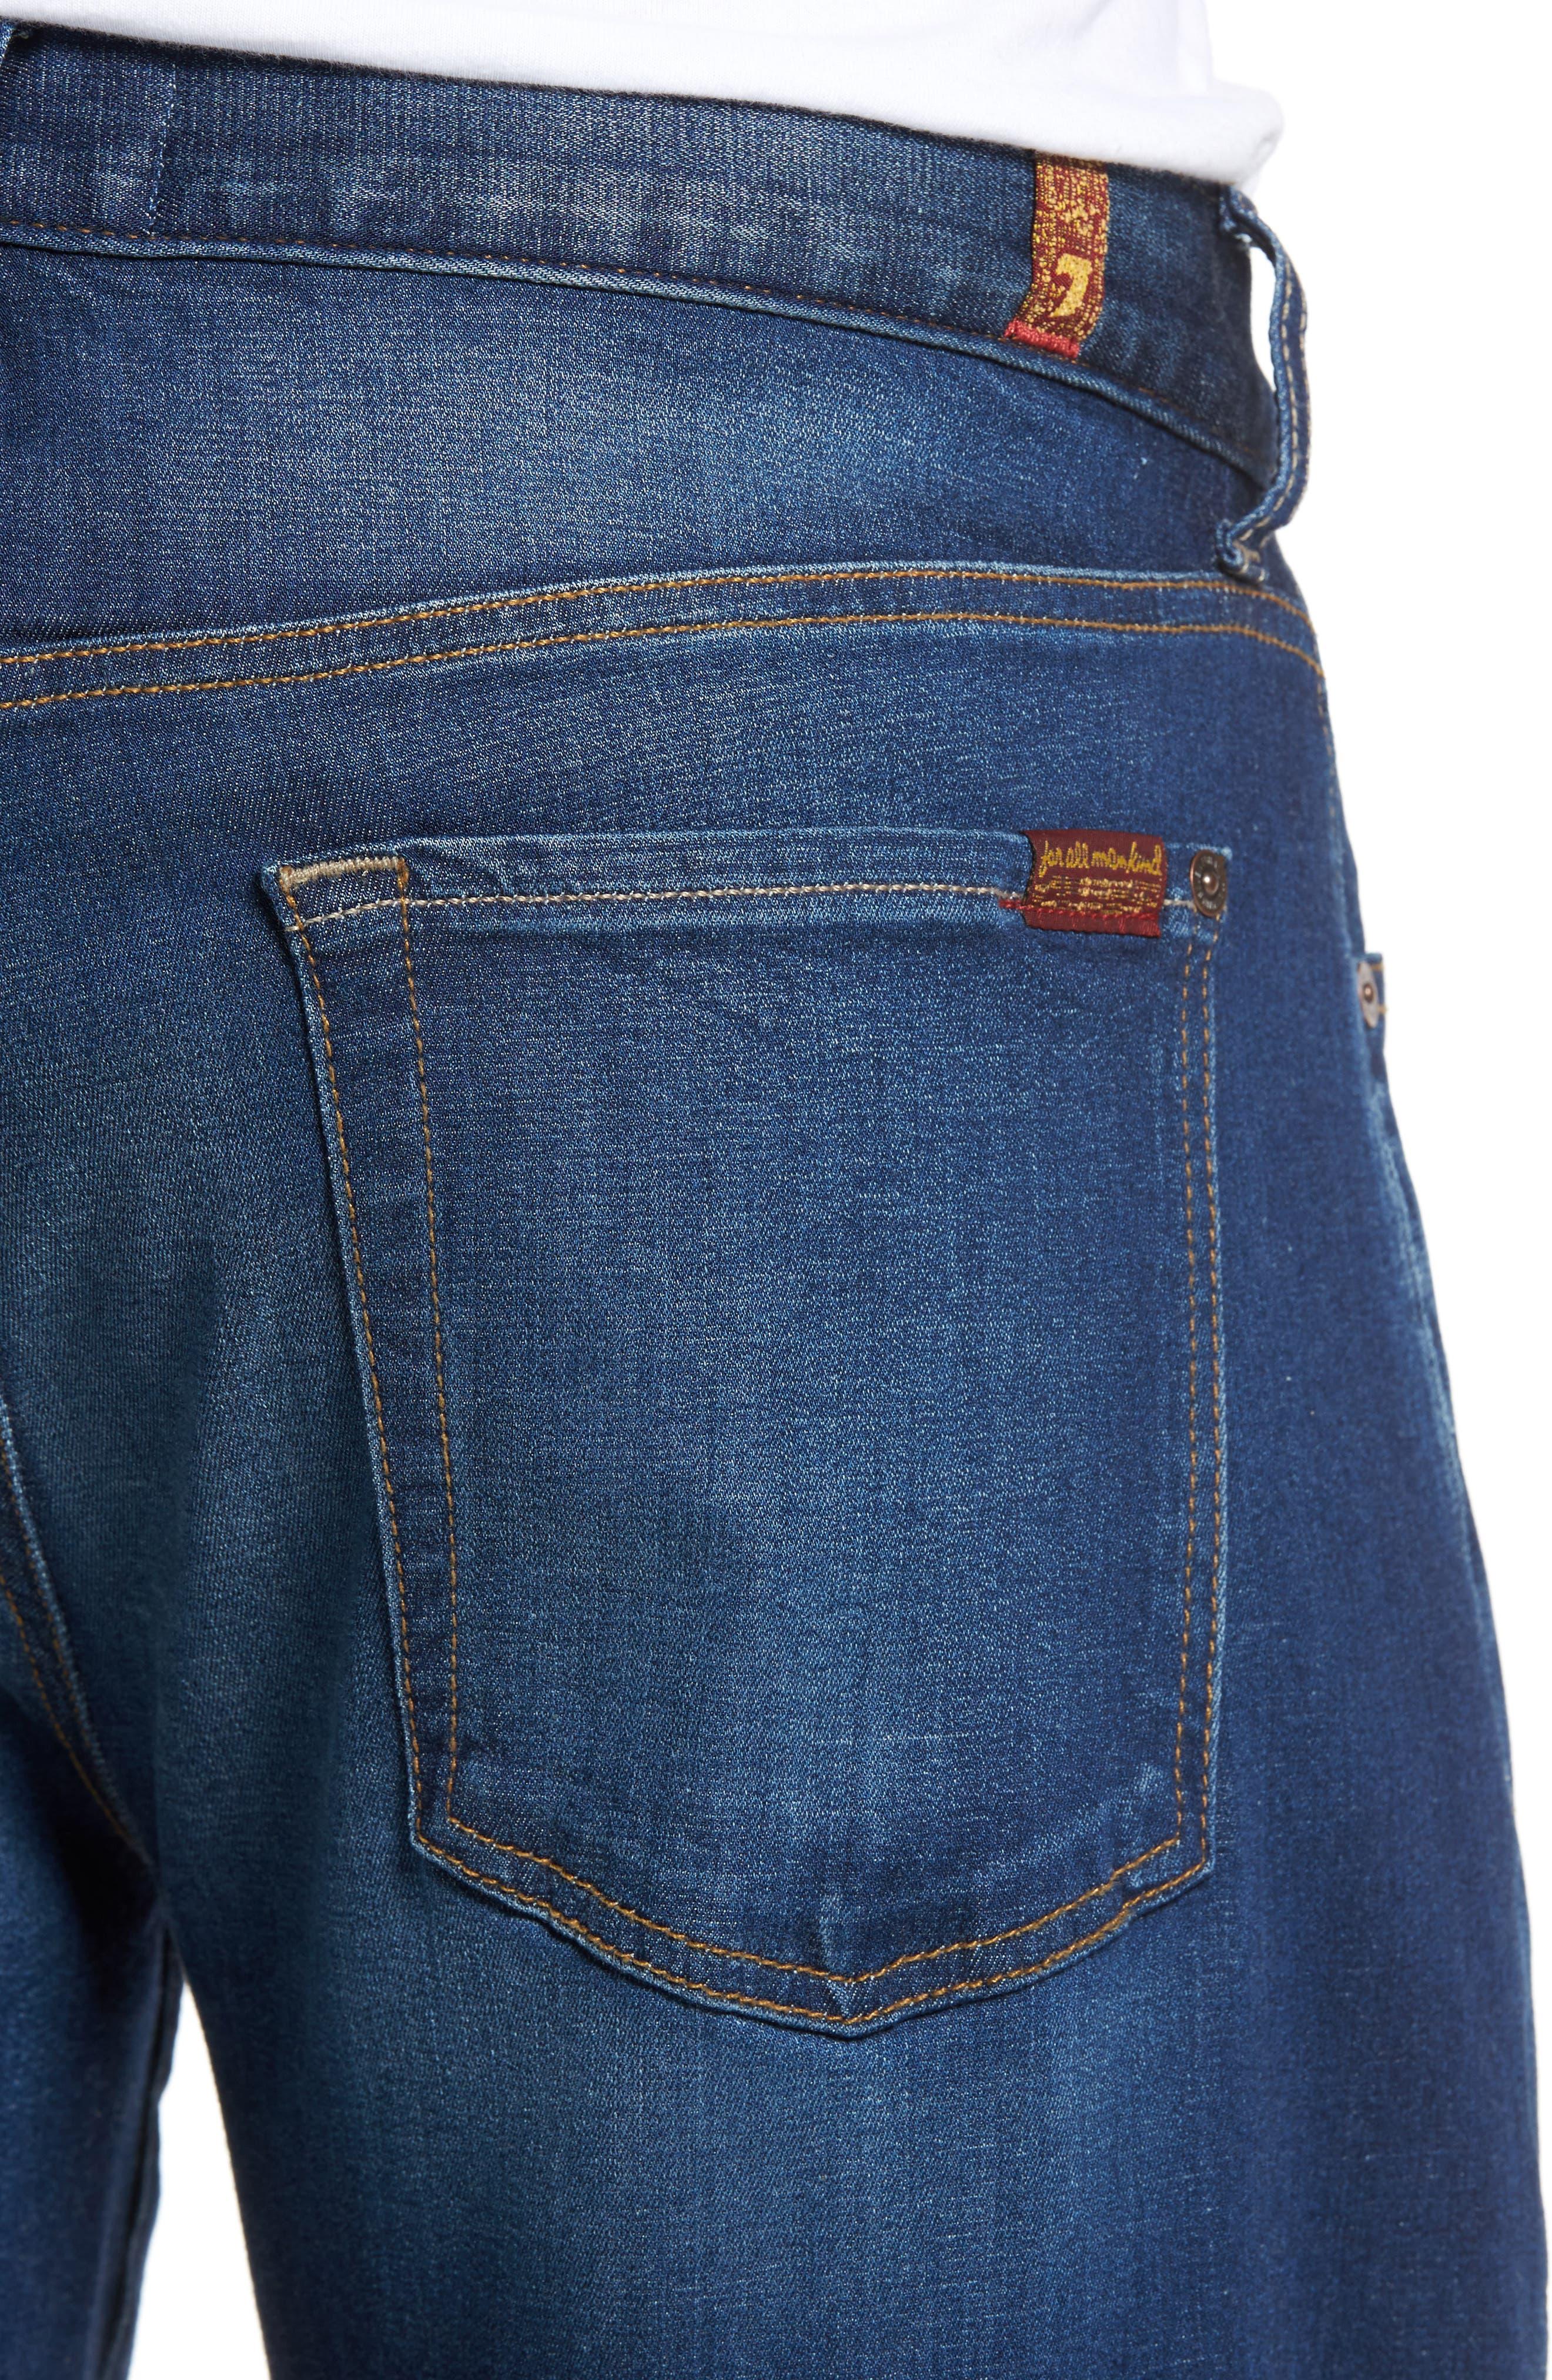 Alternate Image 4  - 7 For All Mankind® Slimmy Slim Fit Jeans (MOMT-Momentum)